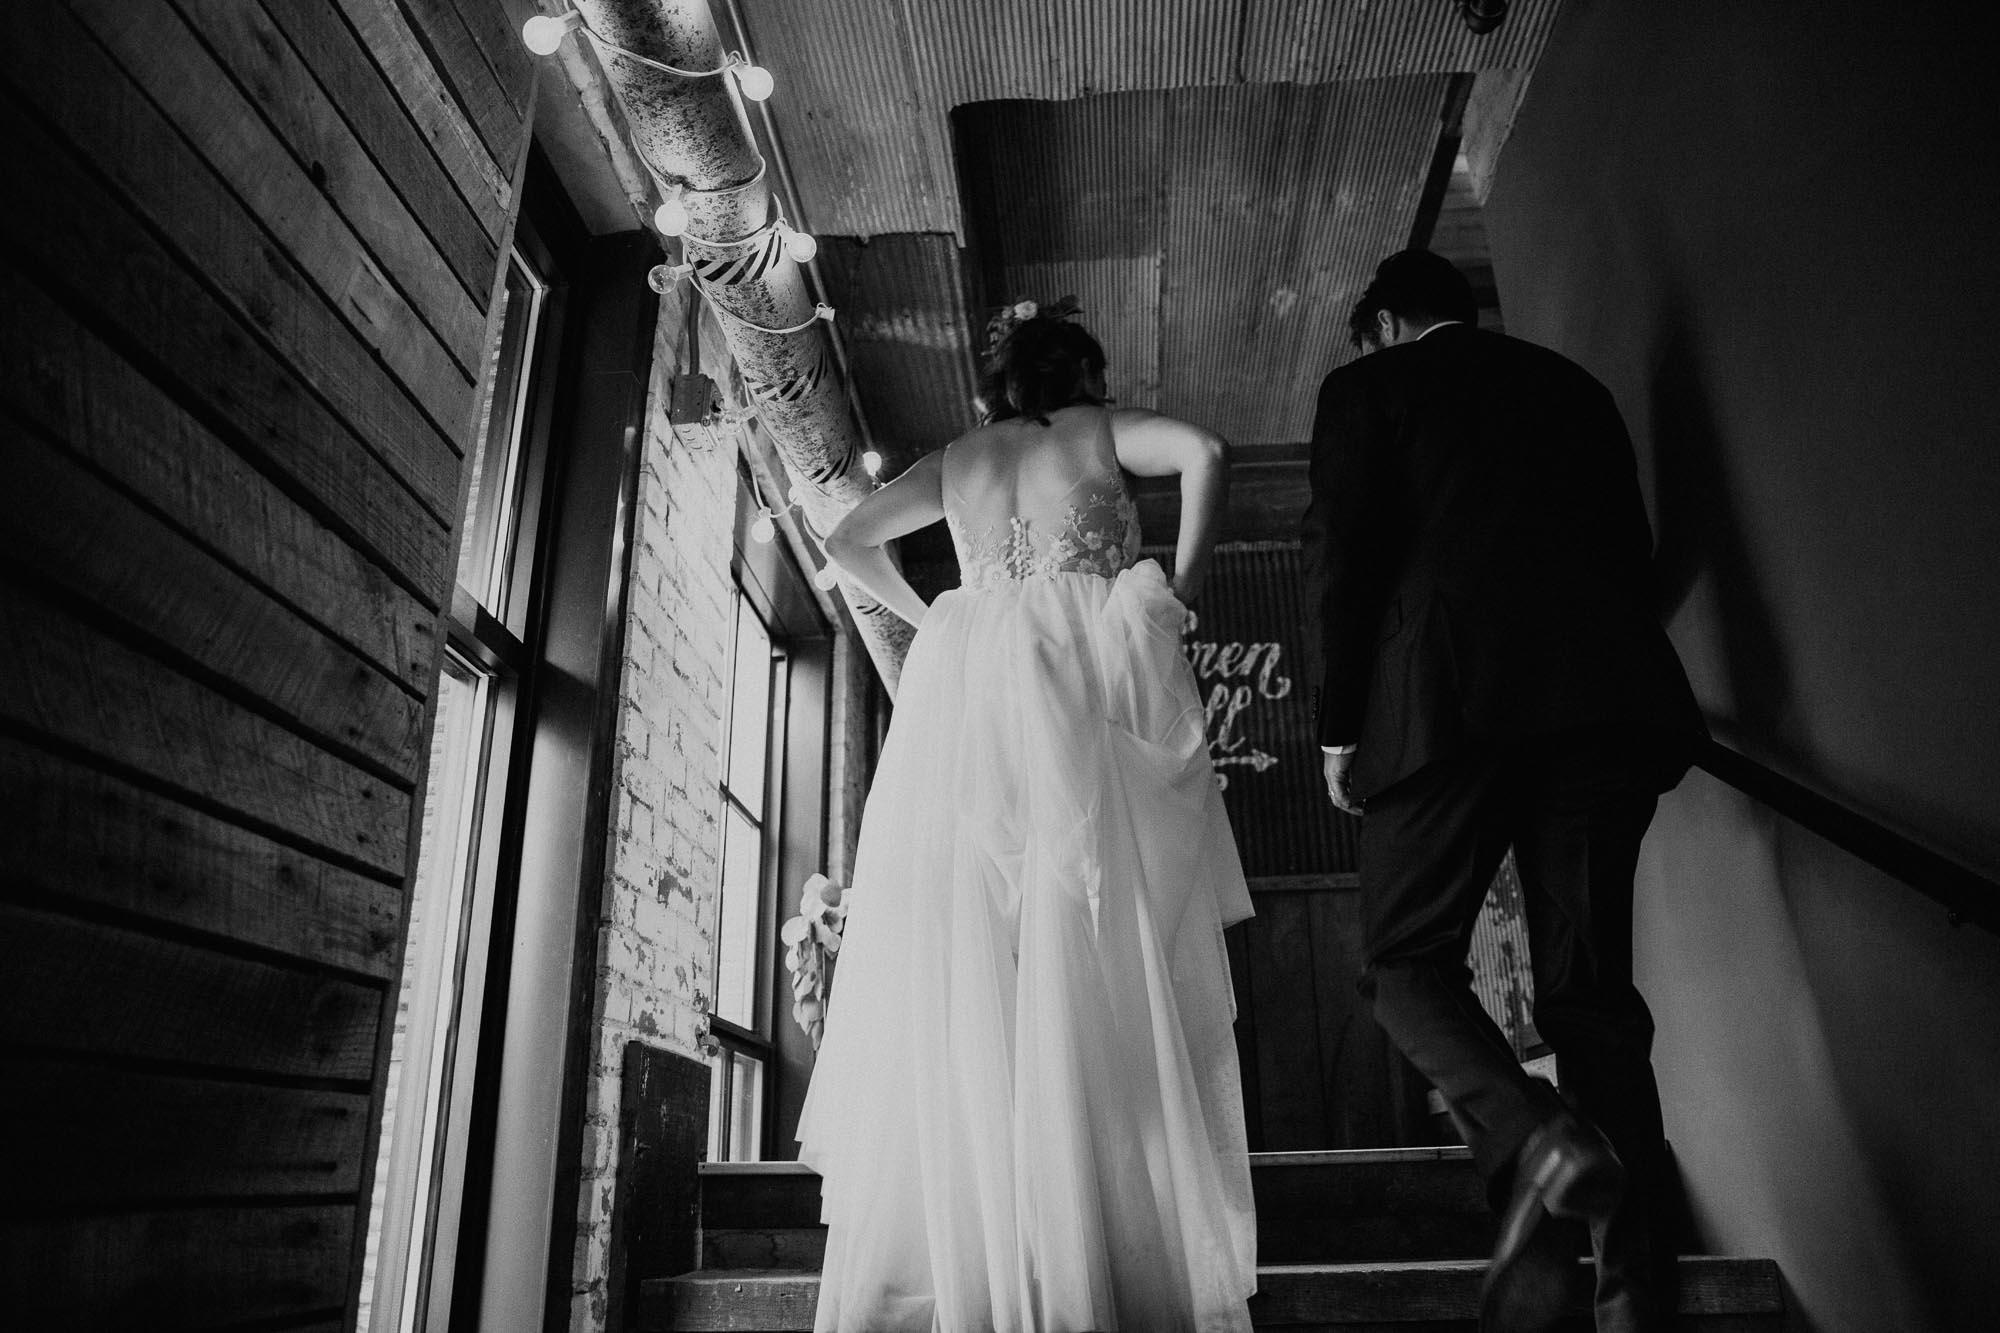 journeyman_distillery_wedding_photographer_chicago_il_wright_photographs-6804.jpg